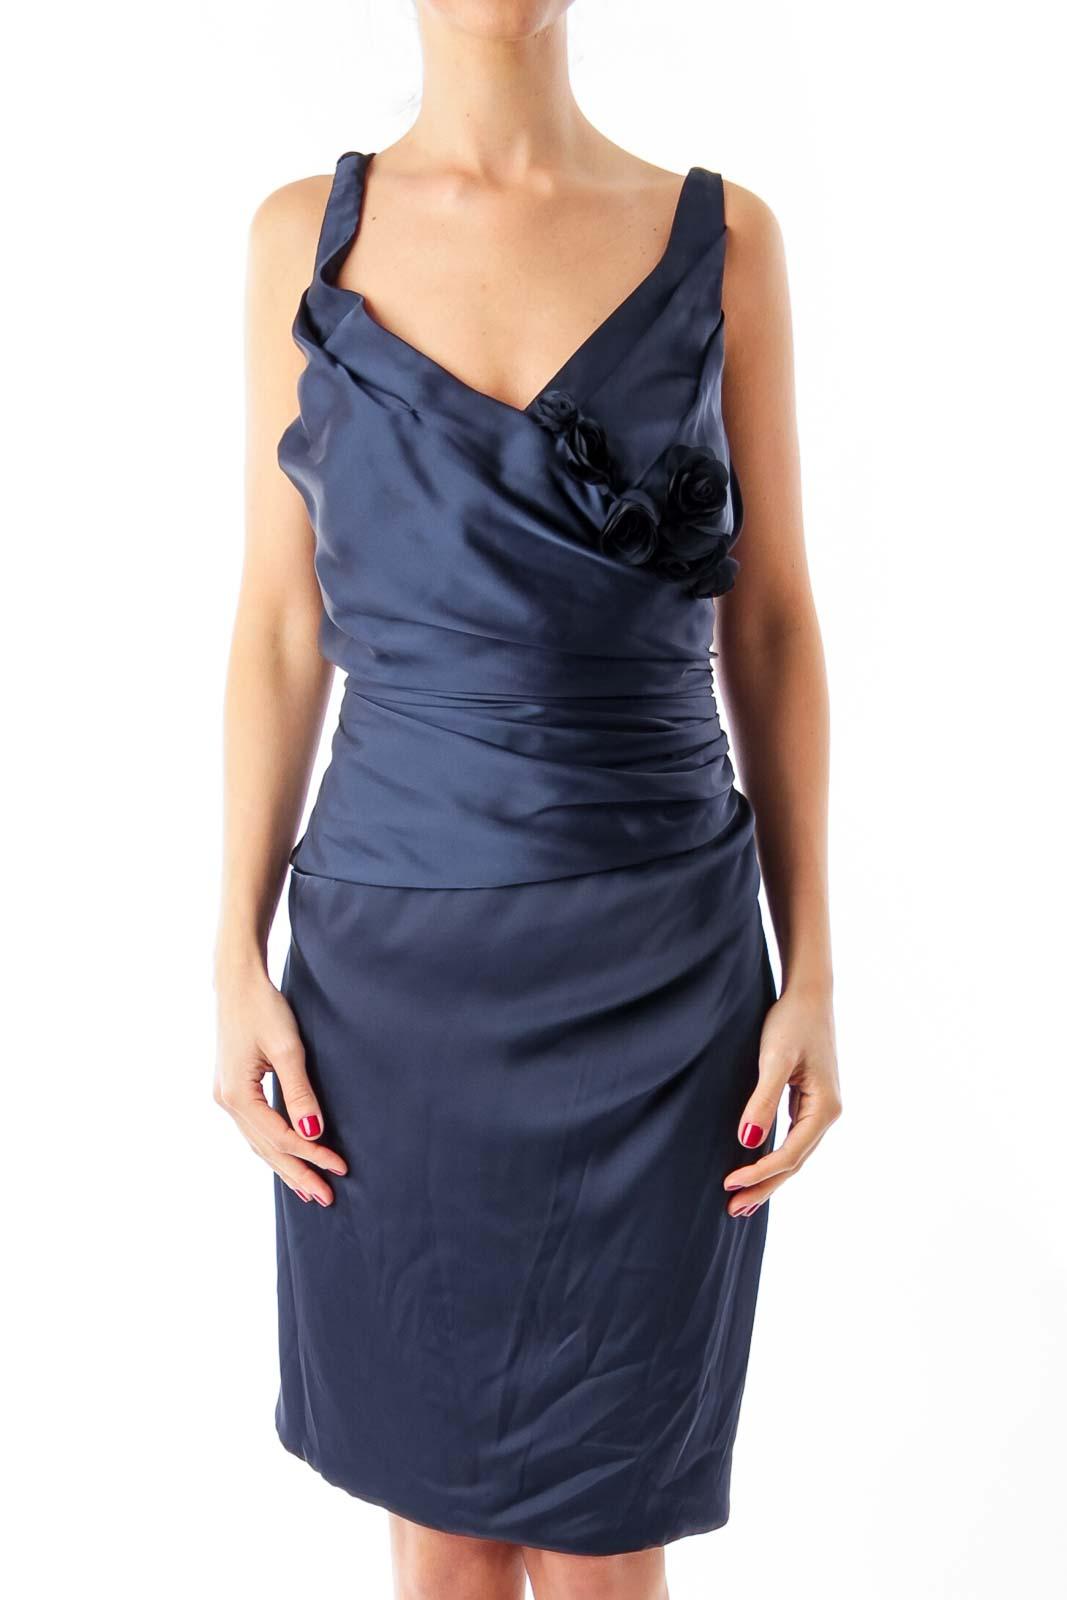 Navy Blue Satin Evening Dress Front